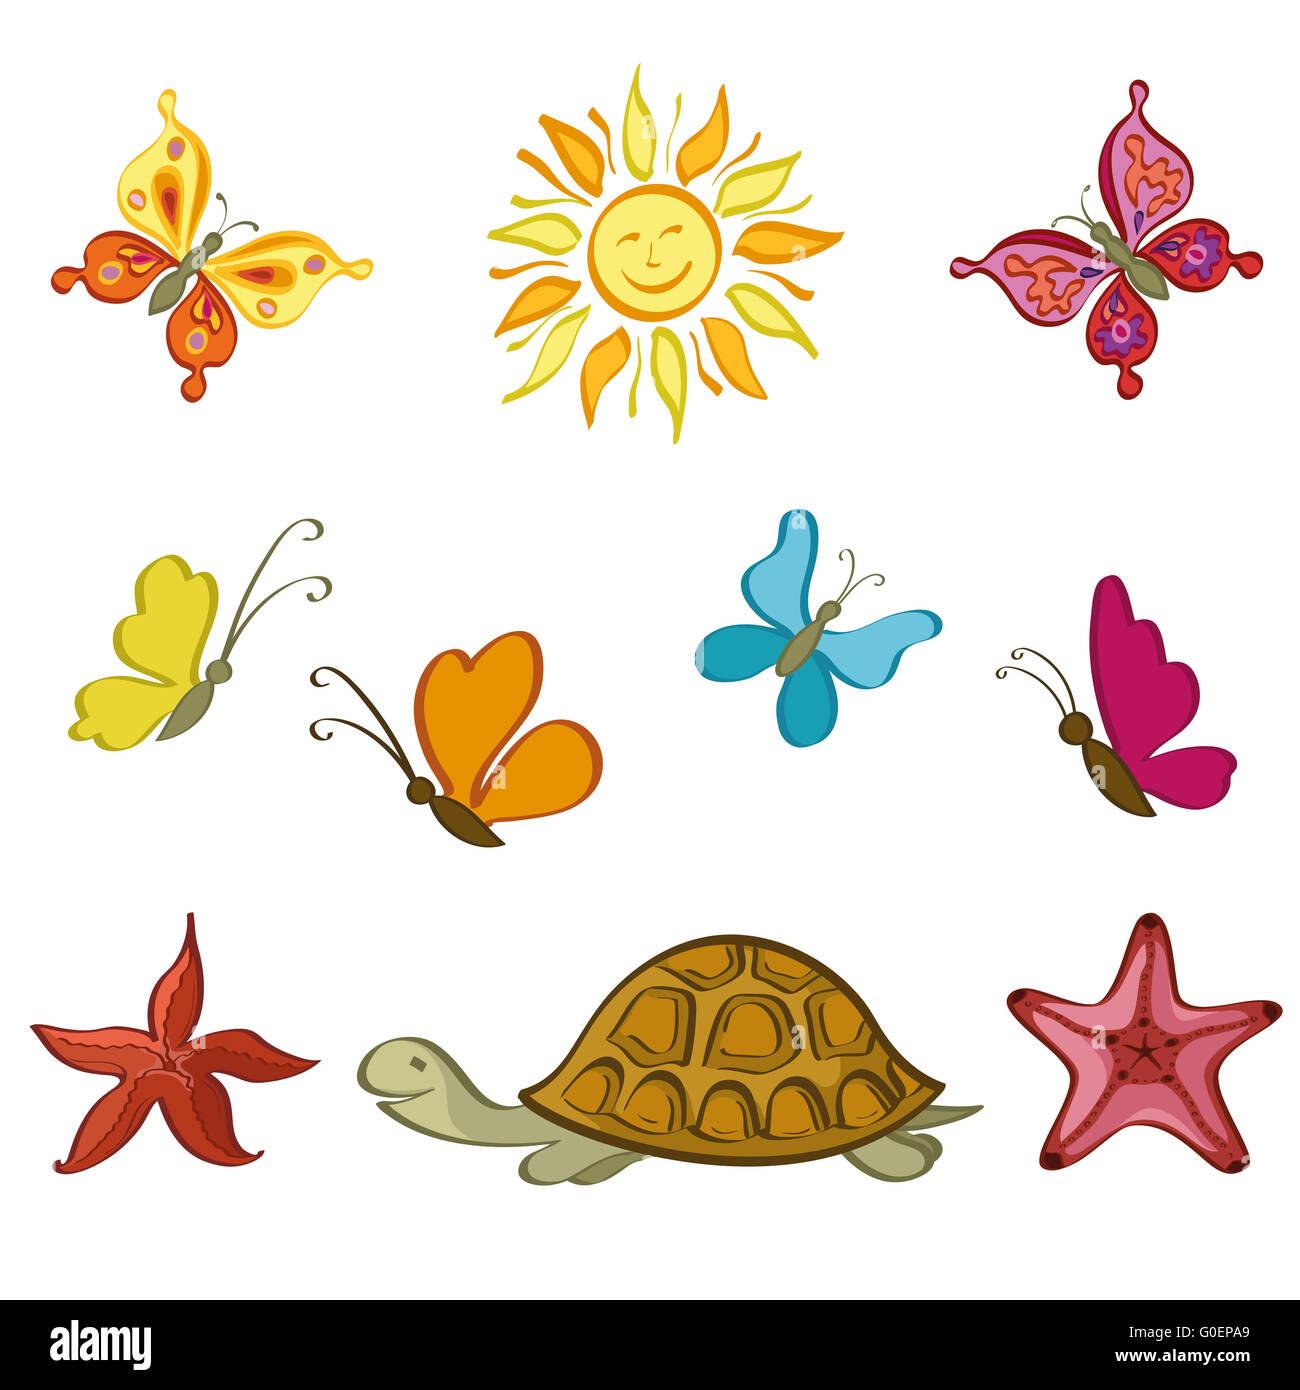 Sun, Butterflies, Turtle and Starfish - Stock Image